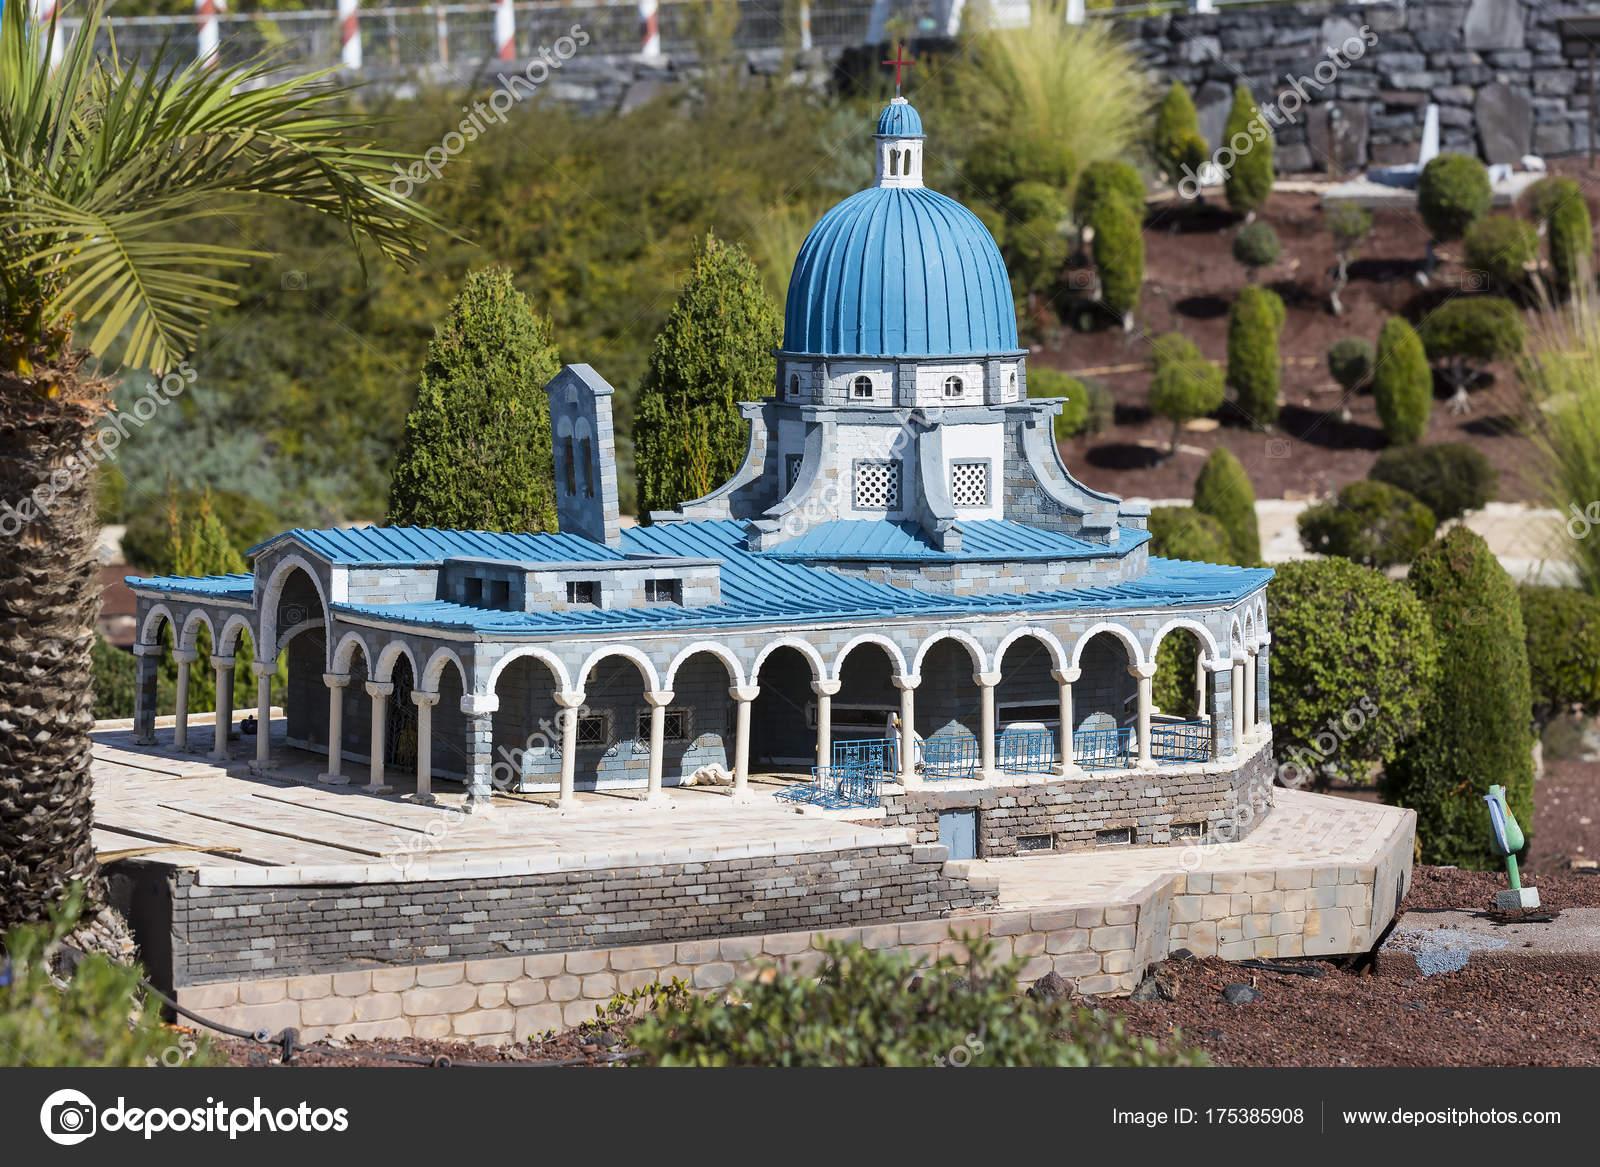 Latrun Israel November 2017 Museum Miniature Architectural Landmarks